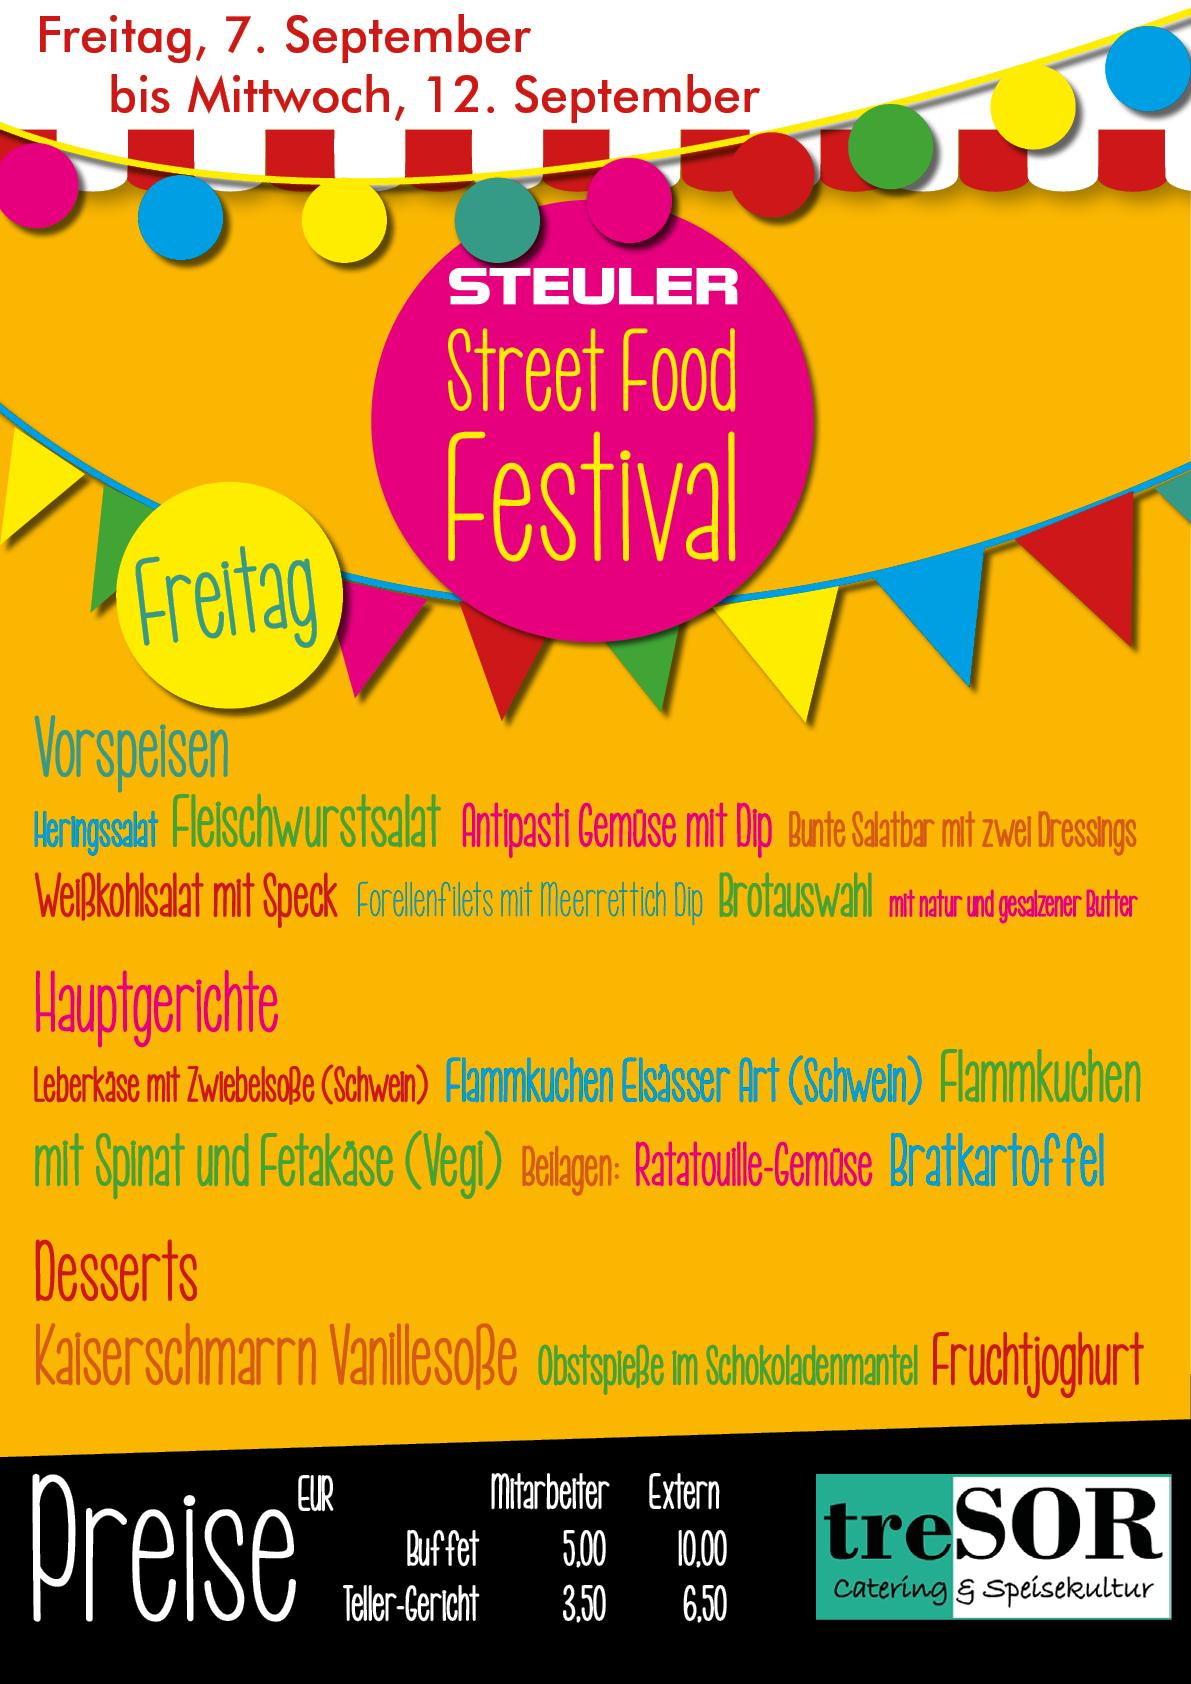 Steuler Street Food Festival 2018-Freitag